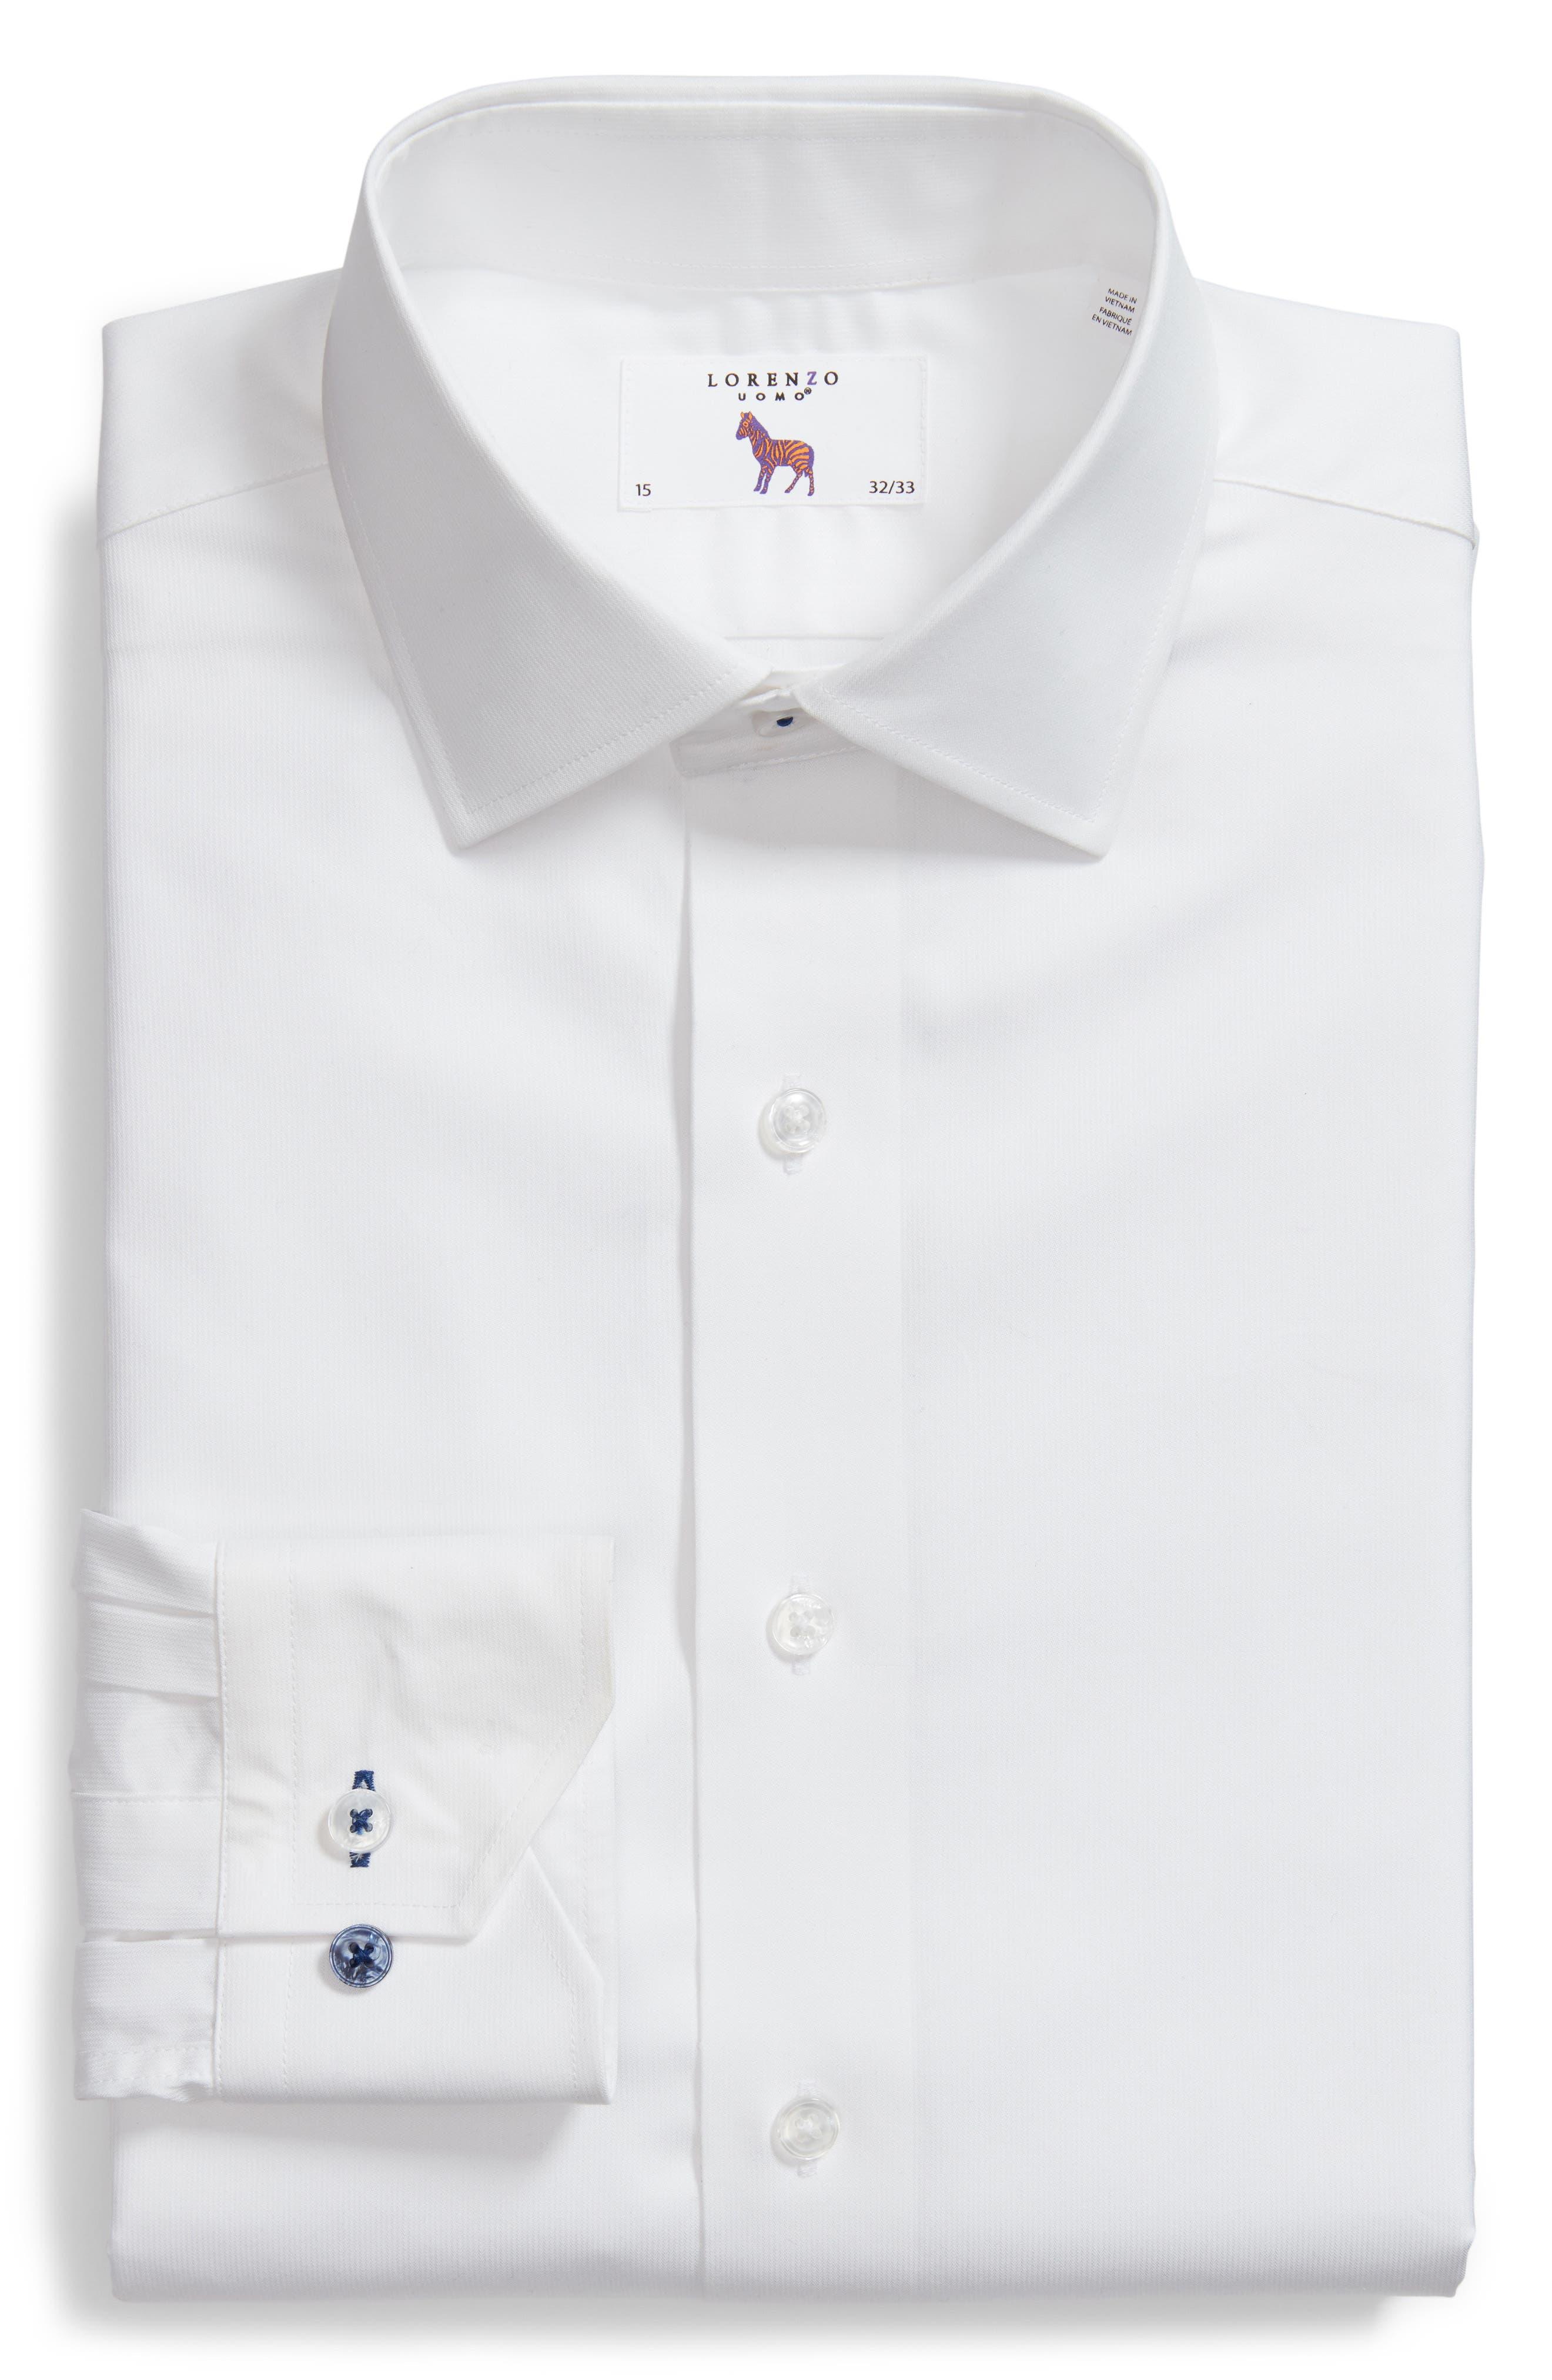 LORENZO UOMO, Trim Fit Solid Dress Shirt, Alternate thumbnail 5, color, WHITE